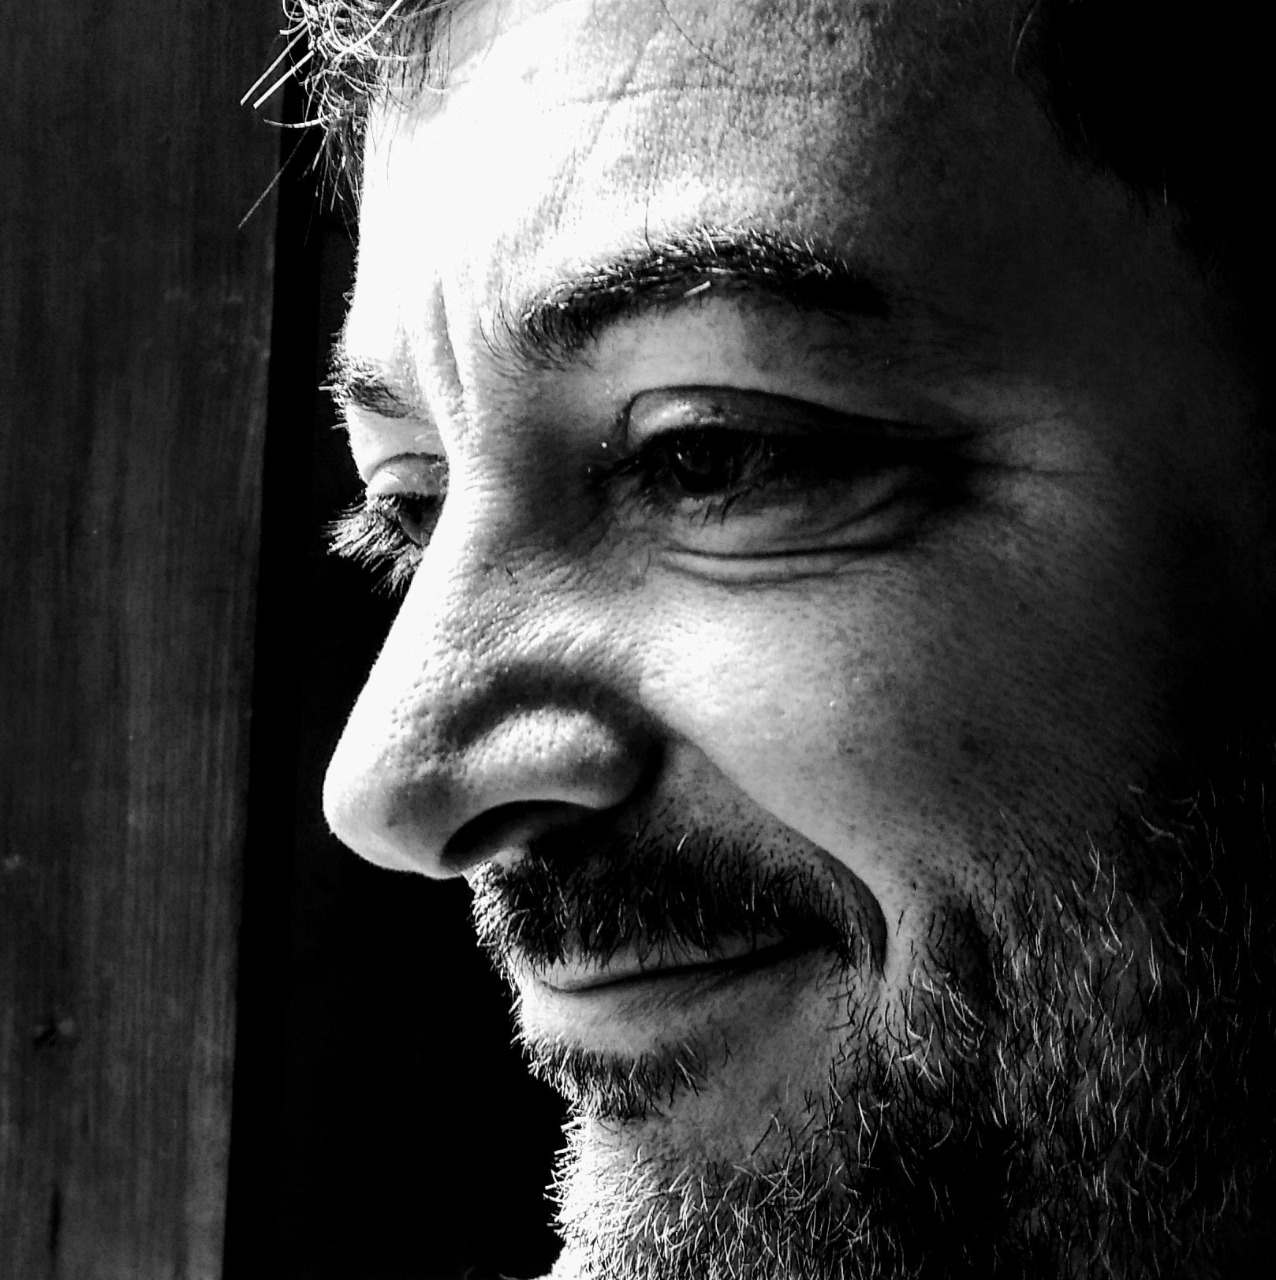 Marcelo Amorim